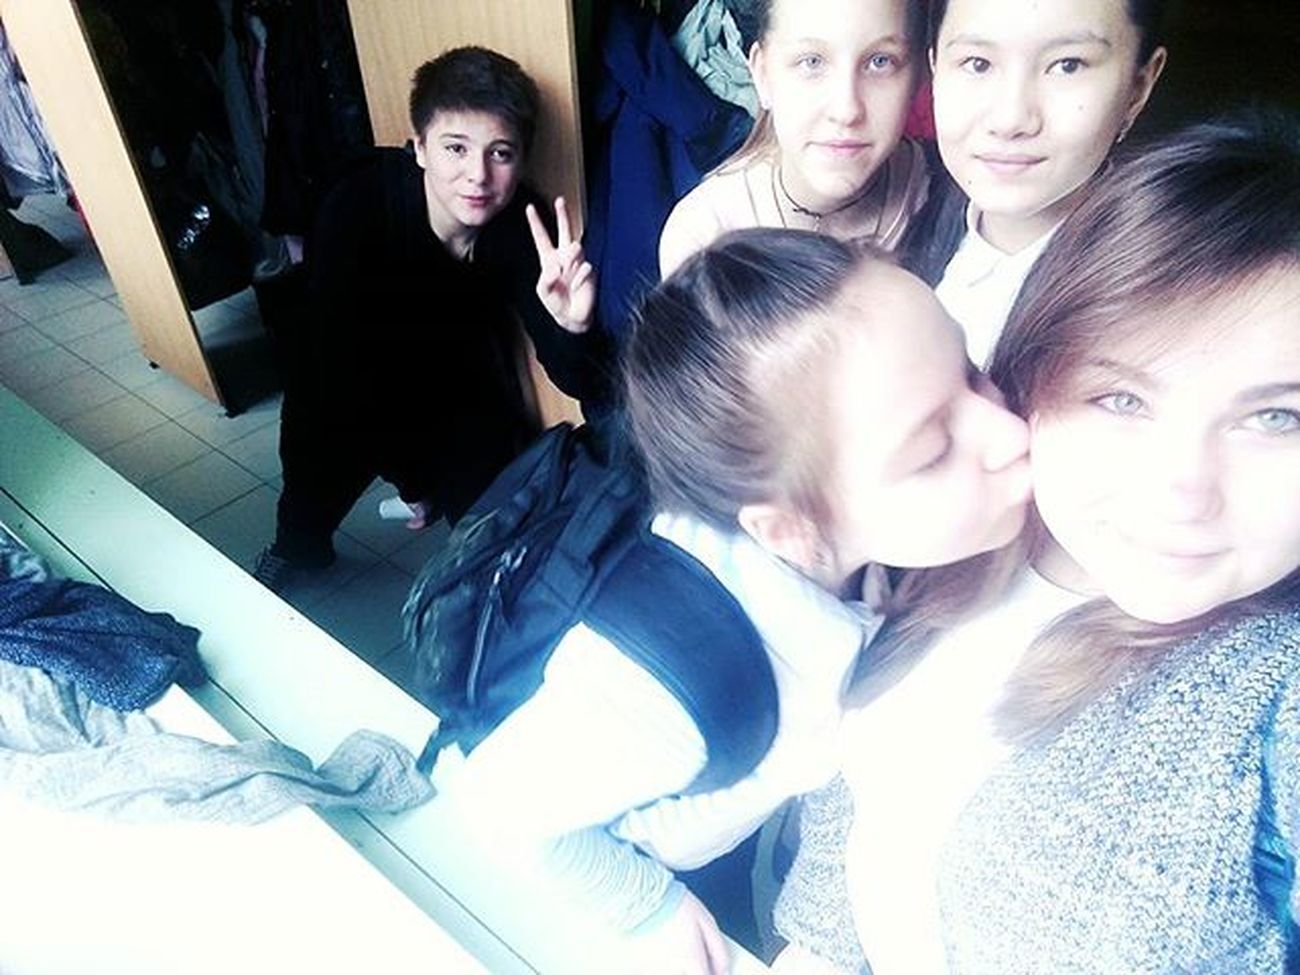 School Friends Mygirls Somebody Lesen Funny Kiss Tagsforlikes Followforfollow Like4like A LOL Likeforlike Школа подруги какойтопарень поцелуйчики 😚 лайкничекакнеродная